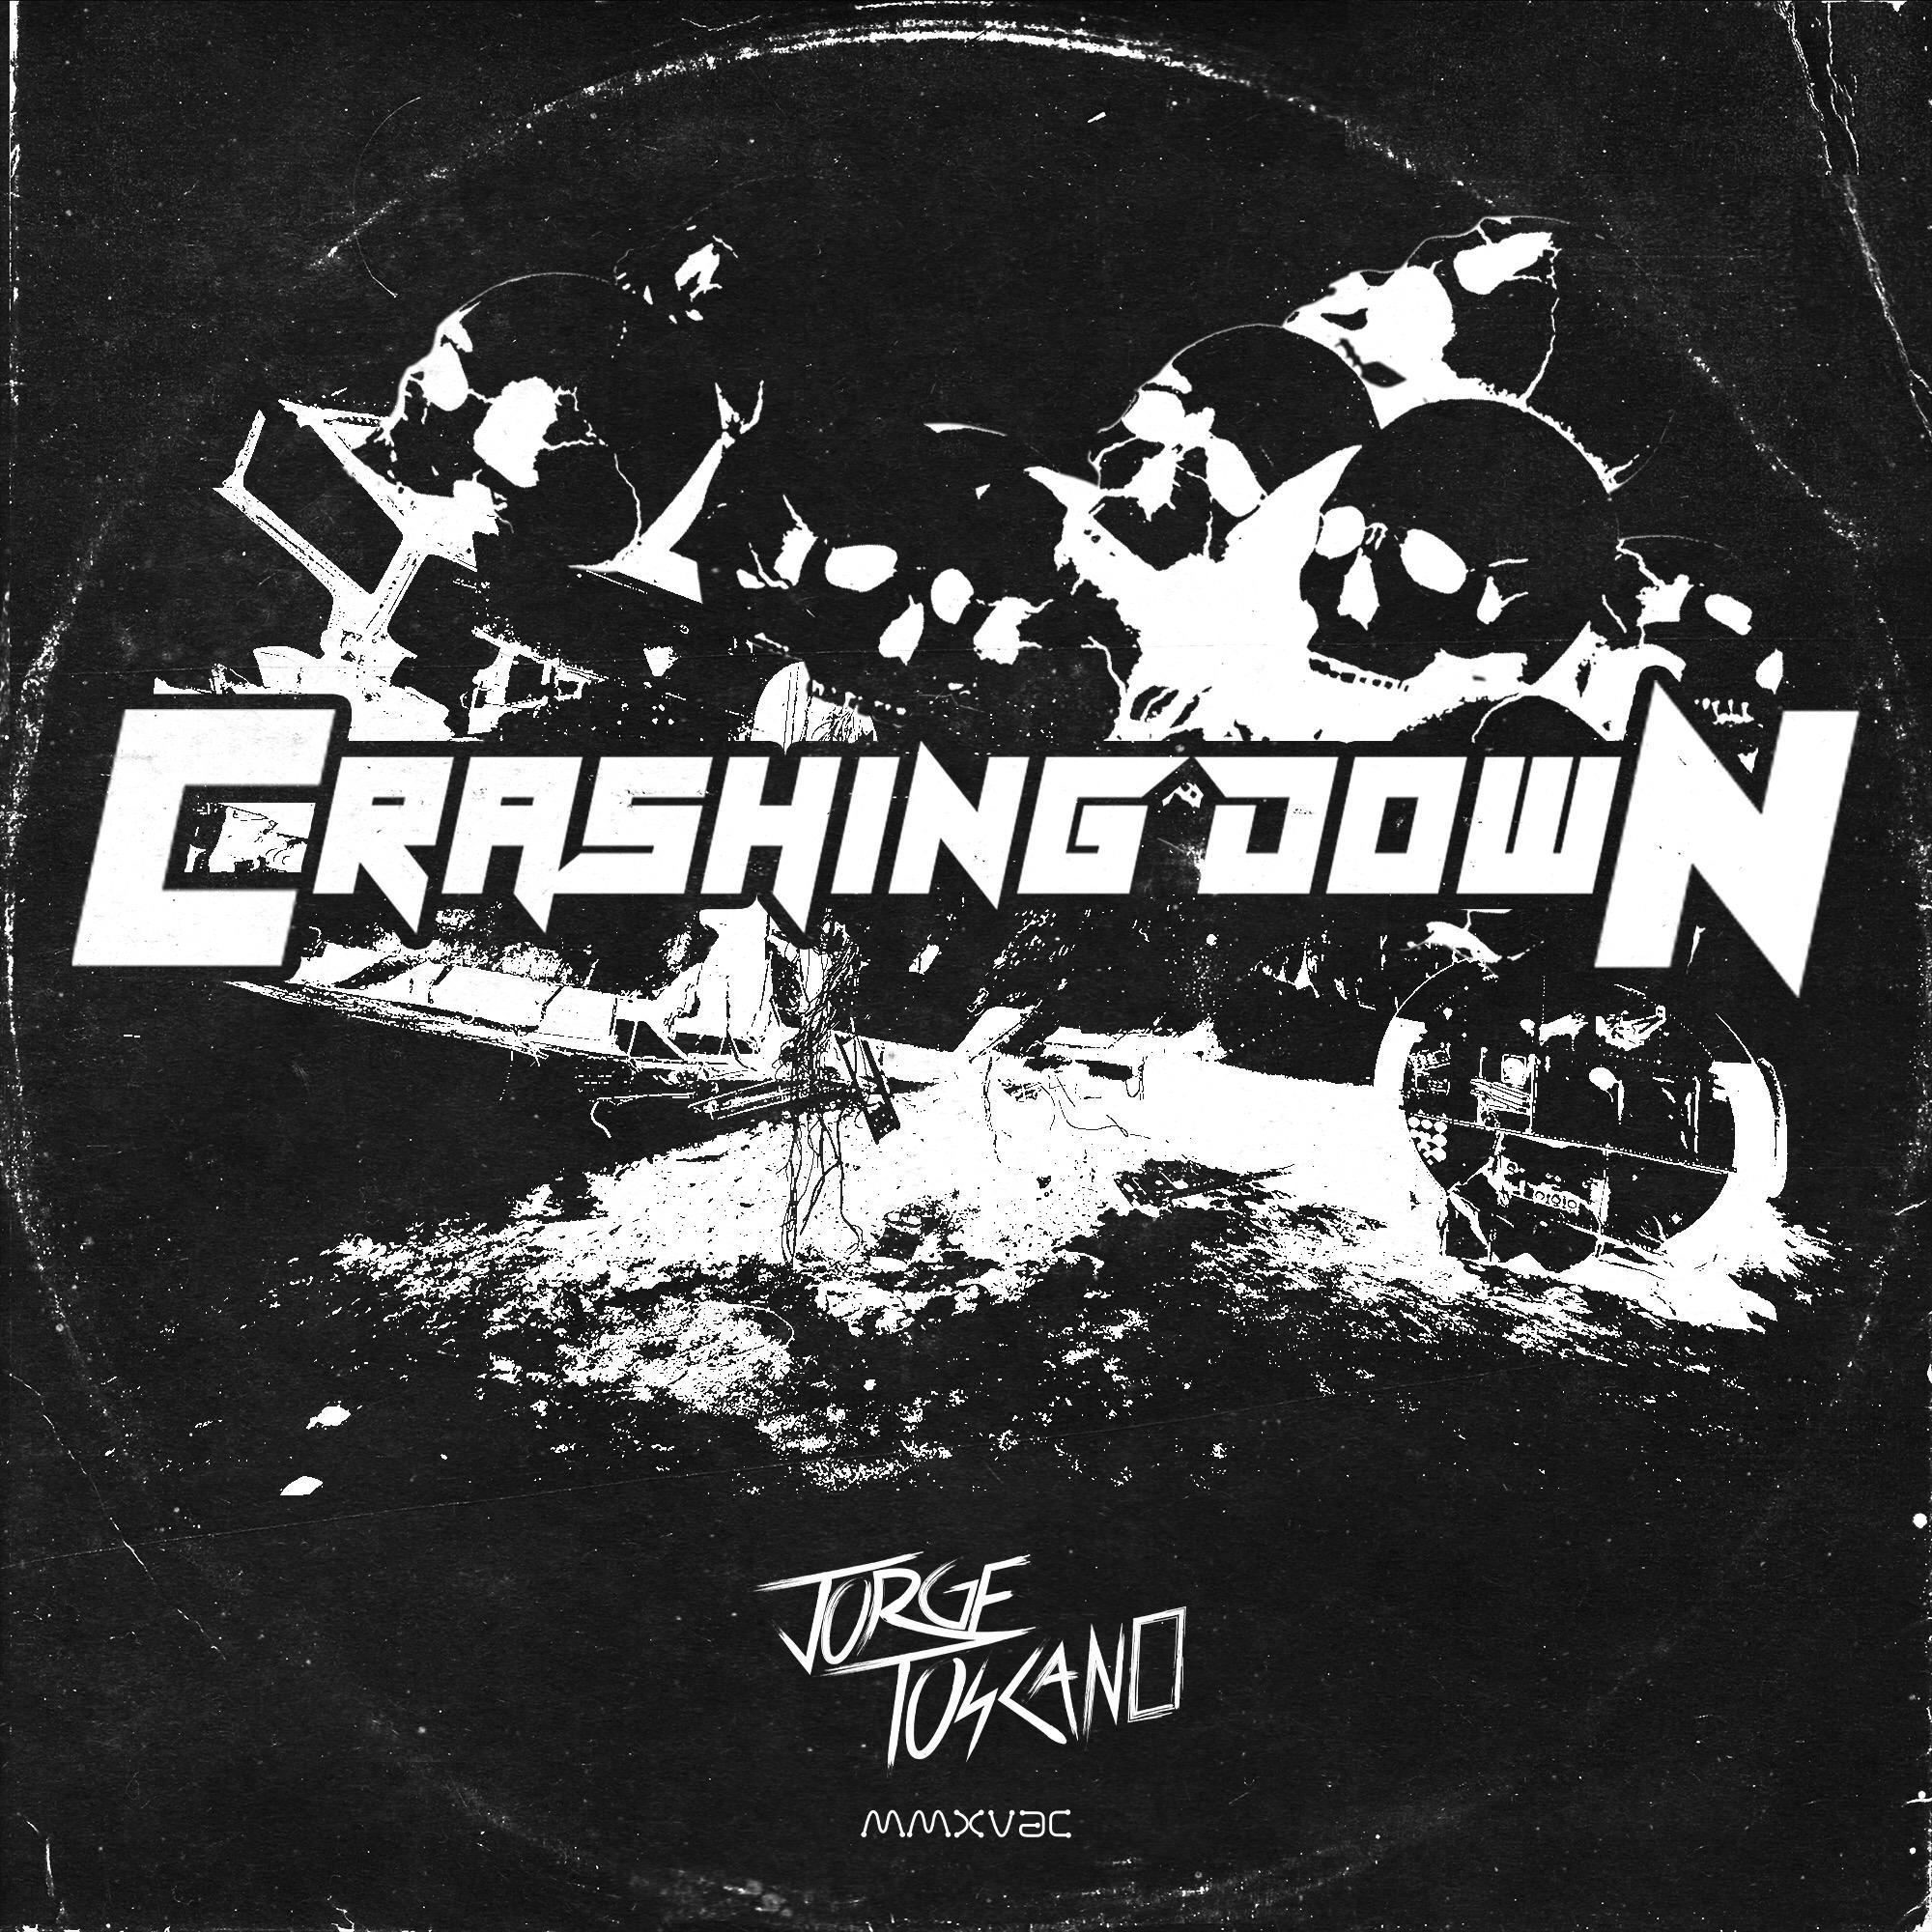 JORGE TOSCANO - CRASHING DOWN